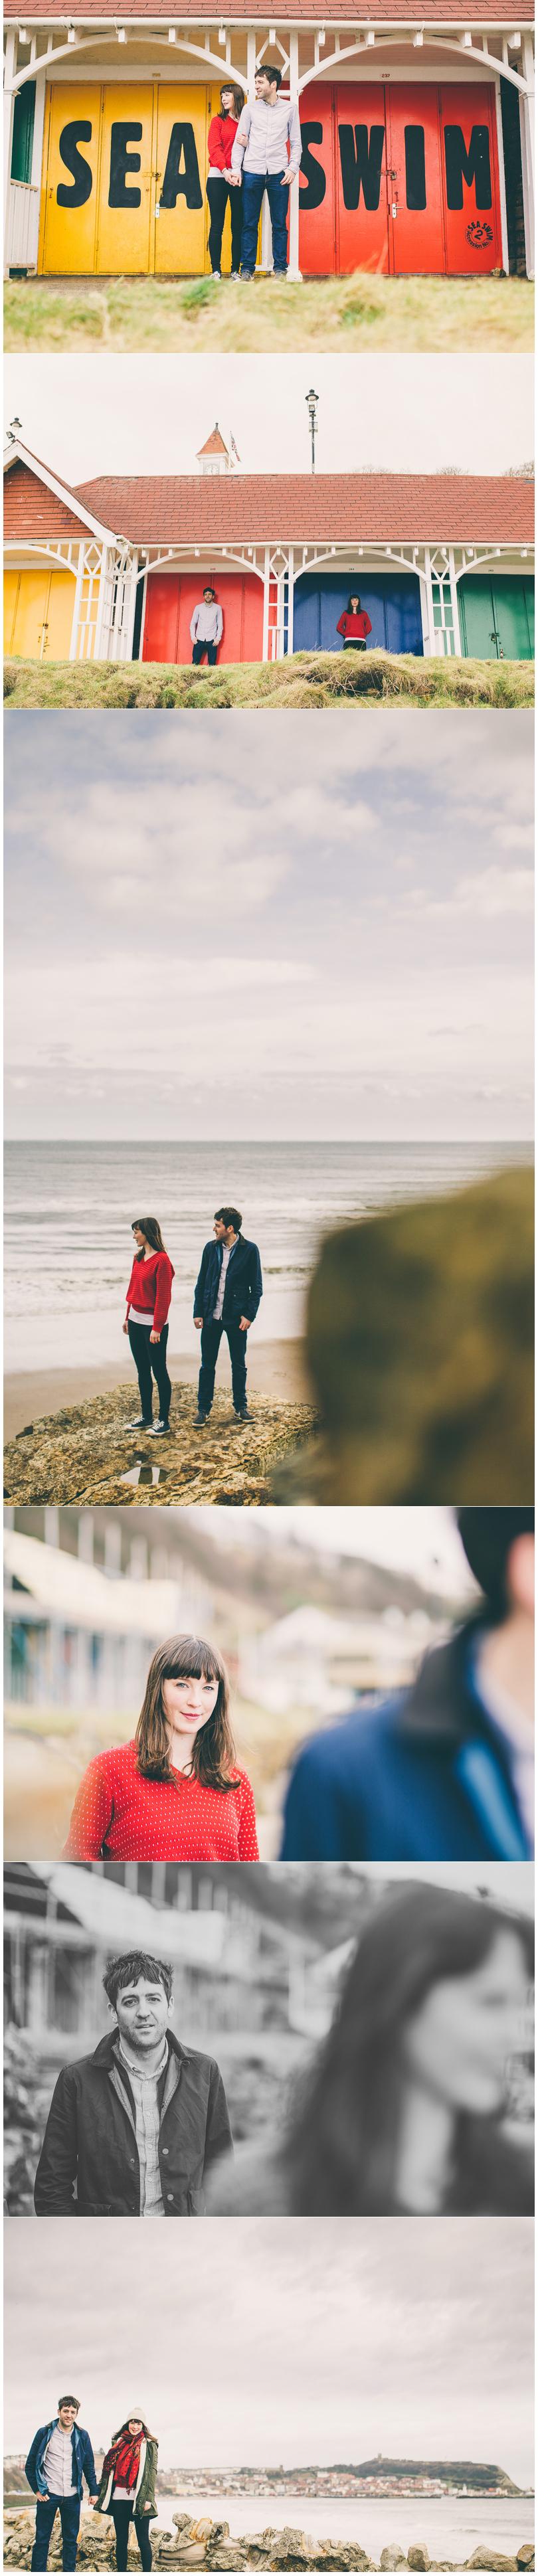 Neil_Jackson_Photographic_Scarborough_York_Yorkshire_Wedding_Photographer_Susie_Jamie_Scalby_South_Bay_Scarborough_Blog3